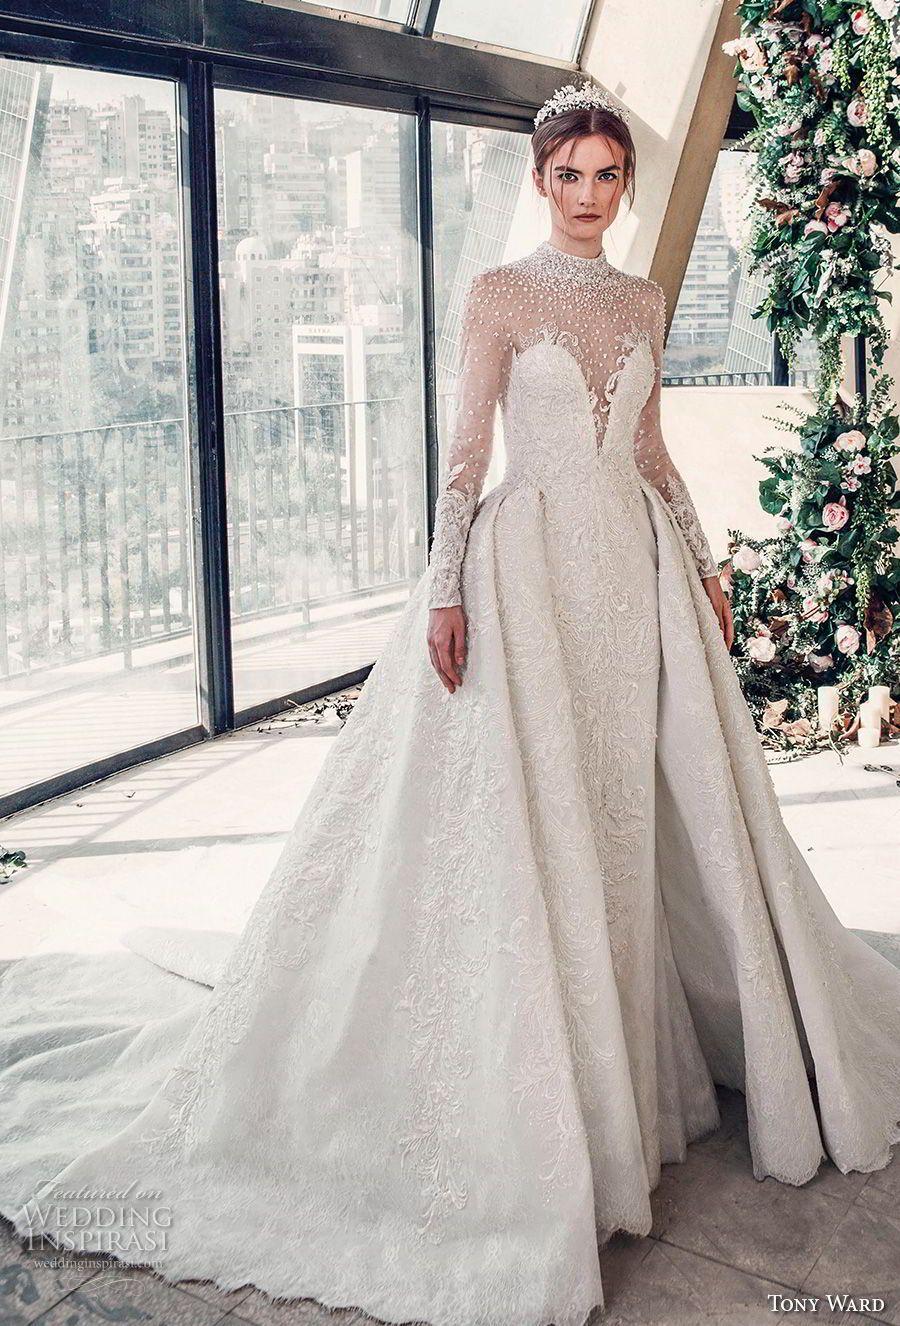 Lace v neck maxi dress april 2019 Tony Ward La Mariée Spring  Wedding Dresses u ucRoman Romance